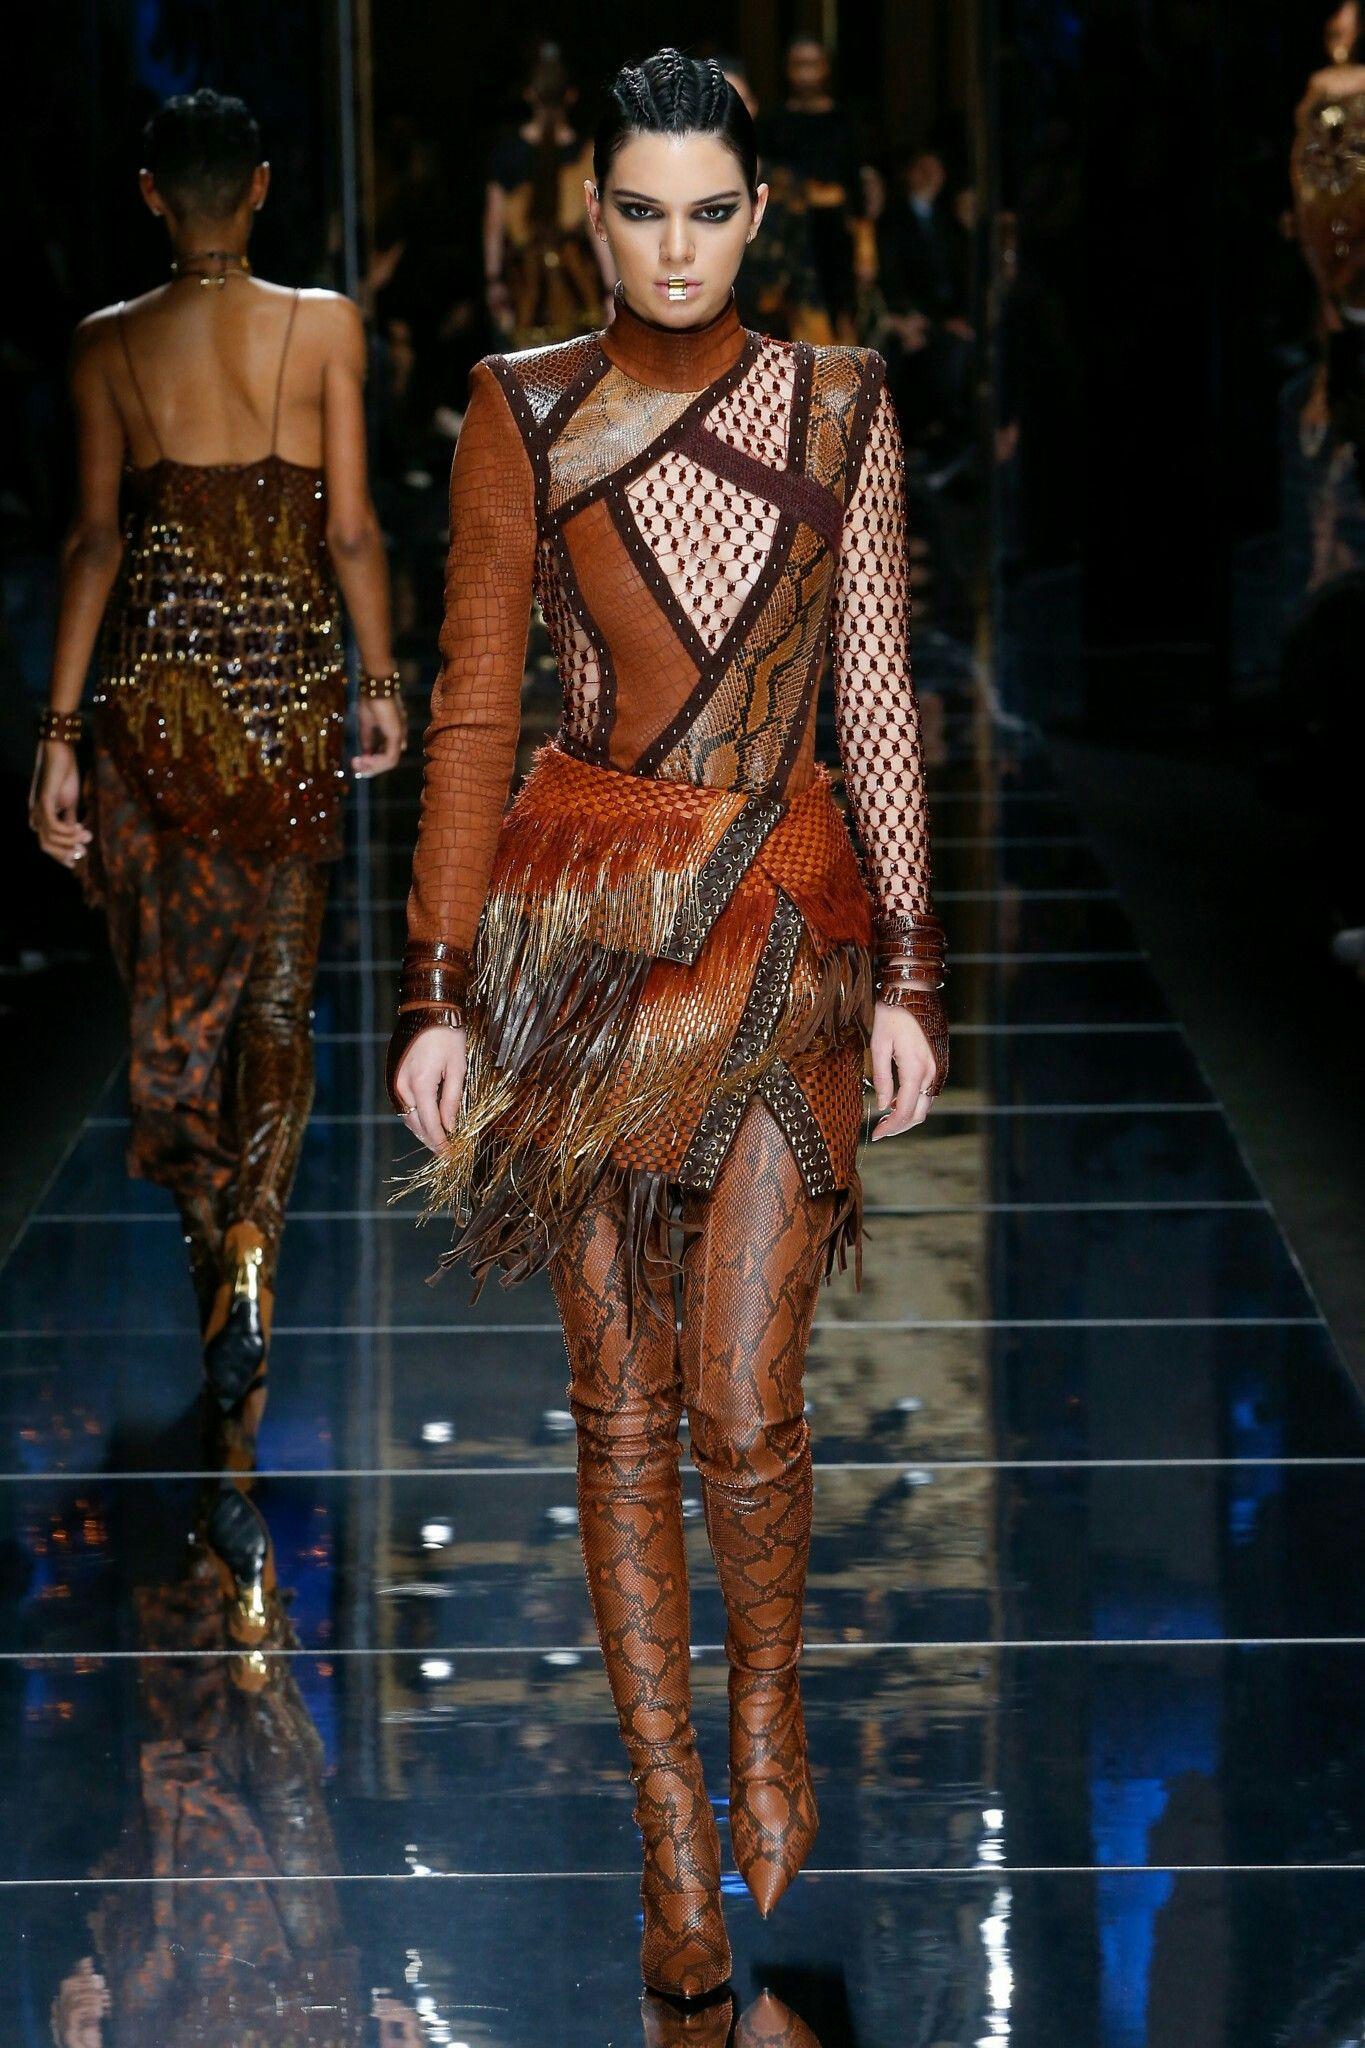 Kendall Jenner And Gigi Hadid Walk In The Balmain SS16